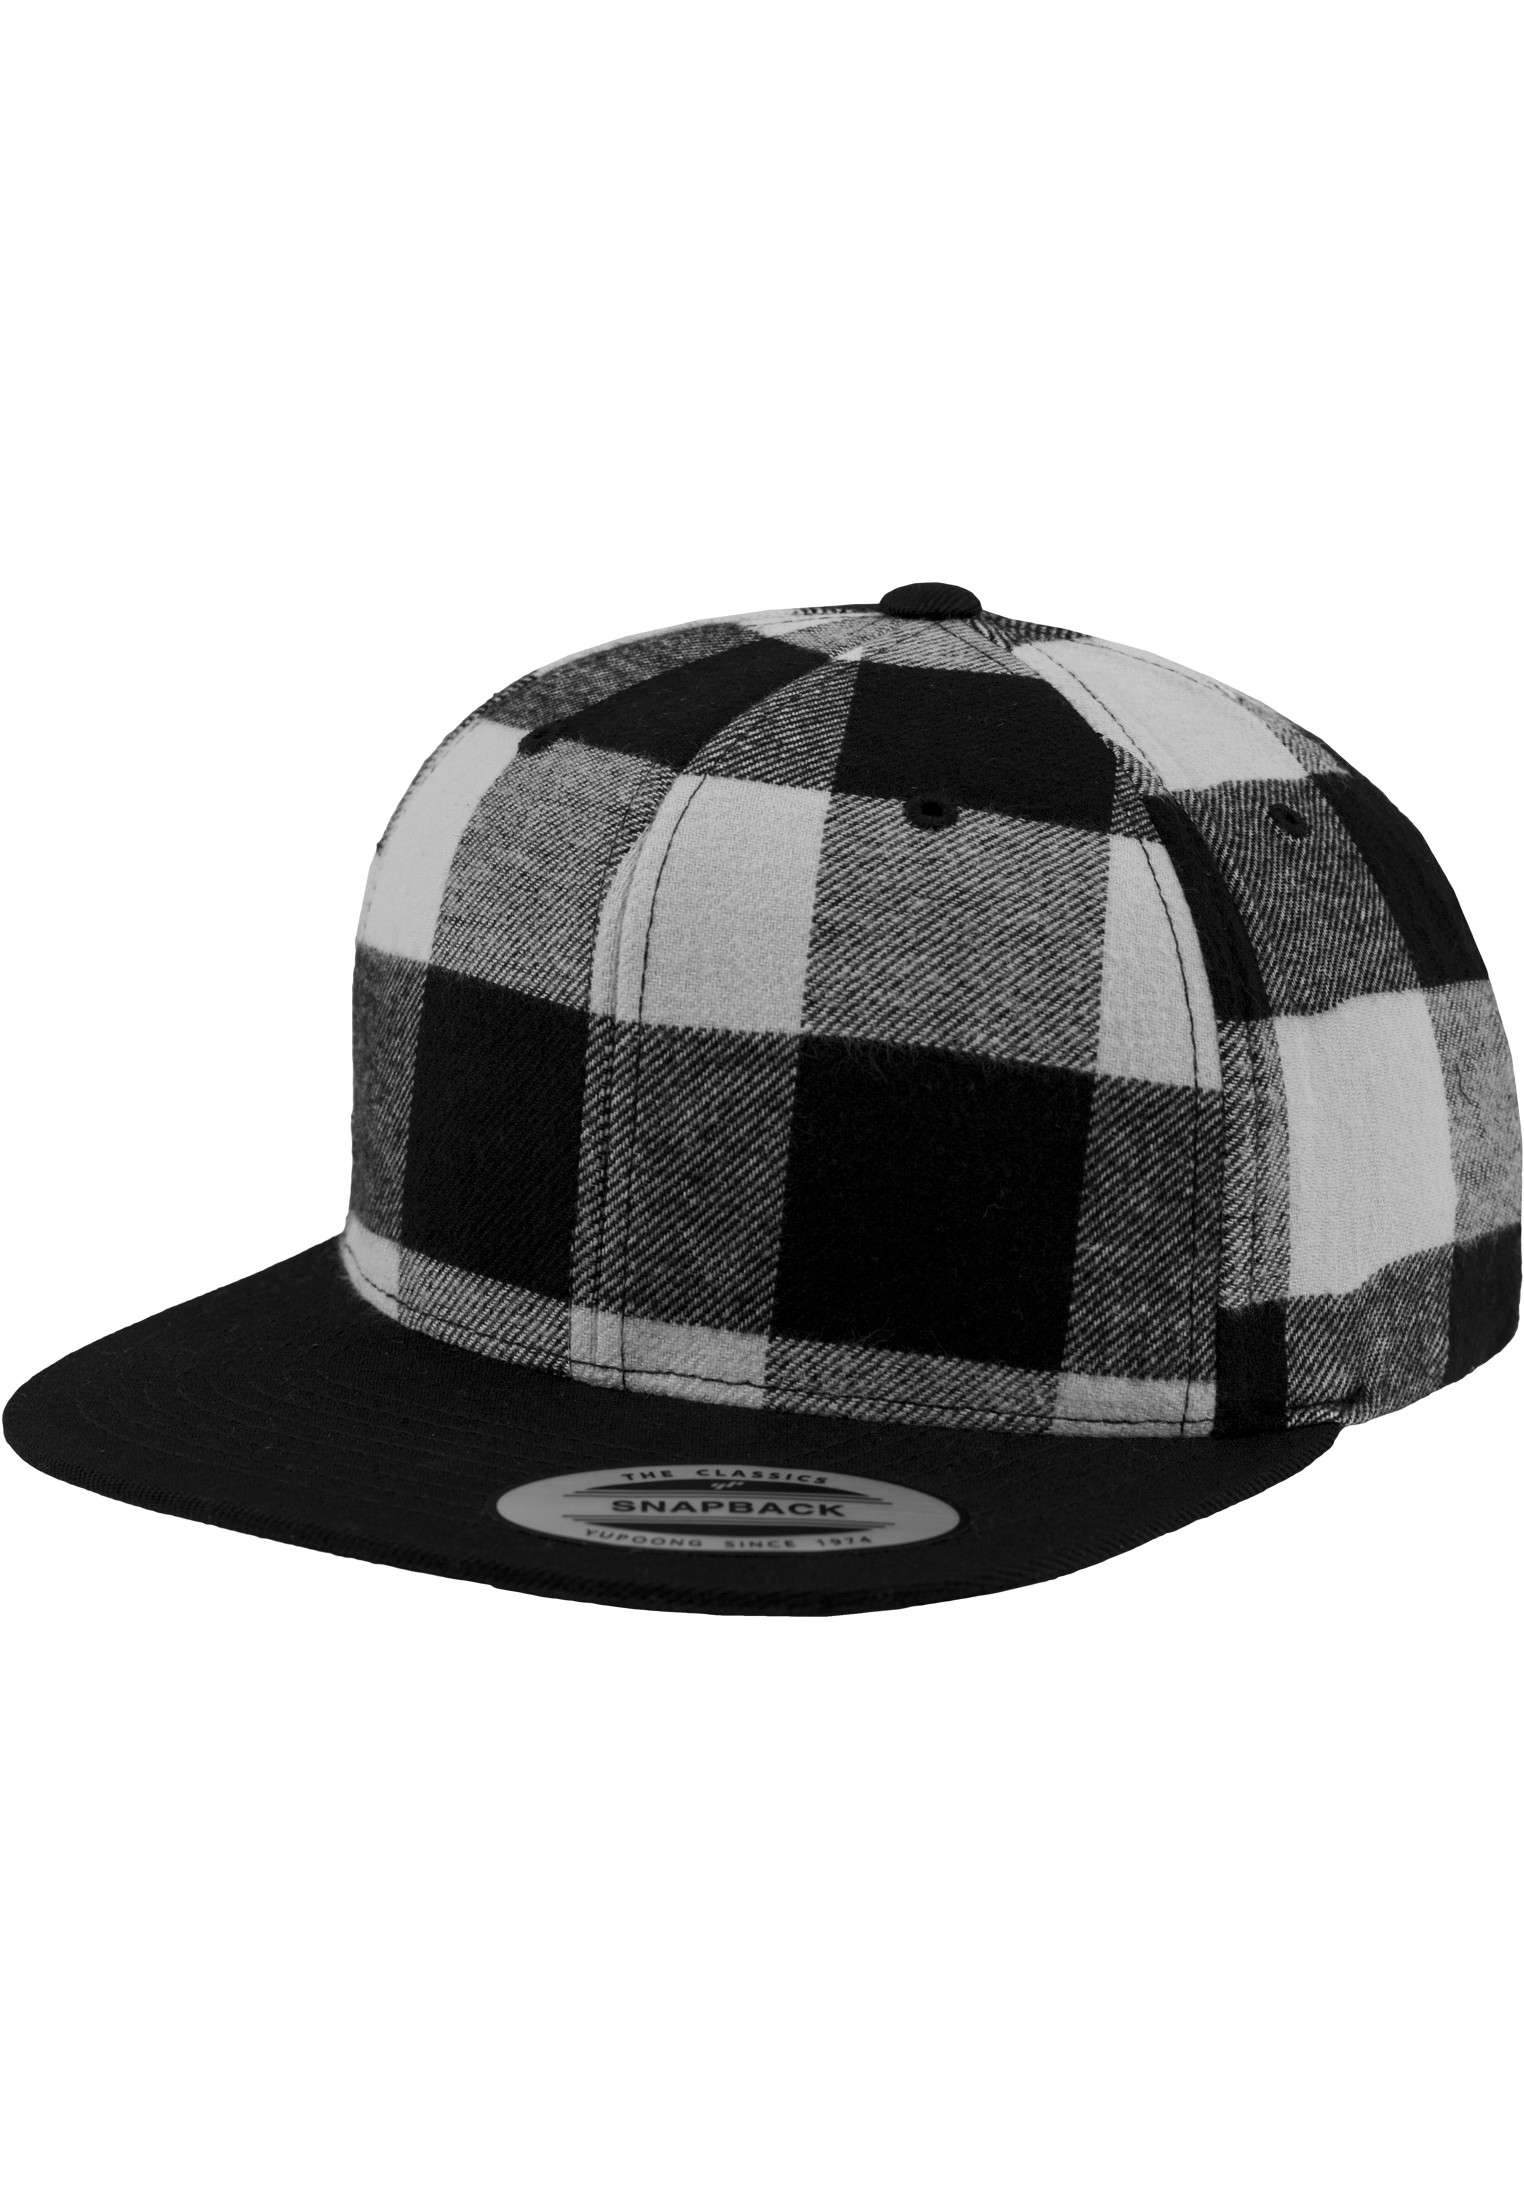 Premium Snapback Cap Flanell Schwarz/Weiss 6 panneaux, ajustable